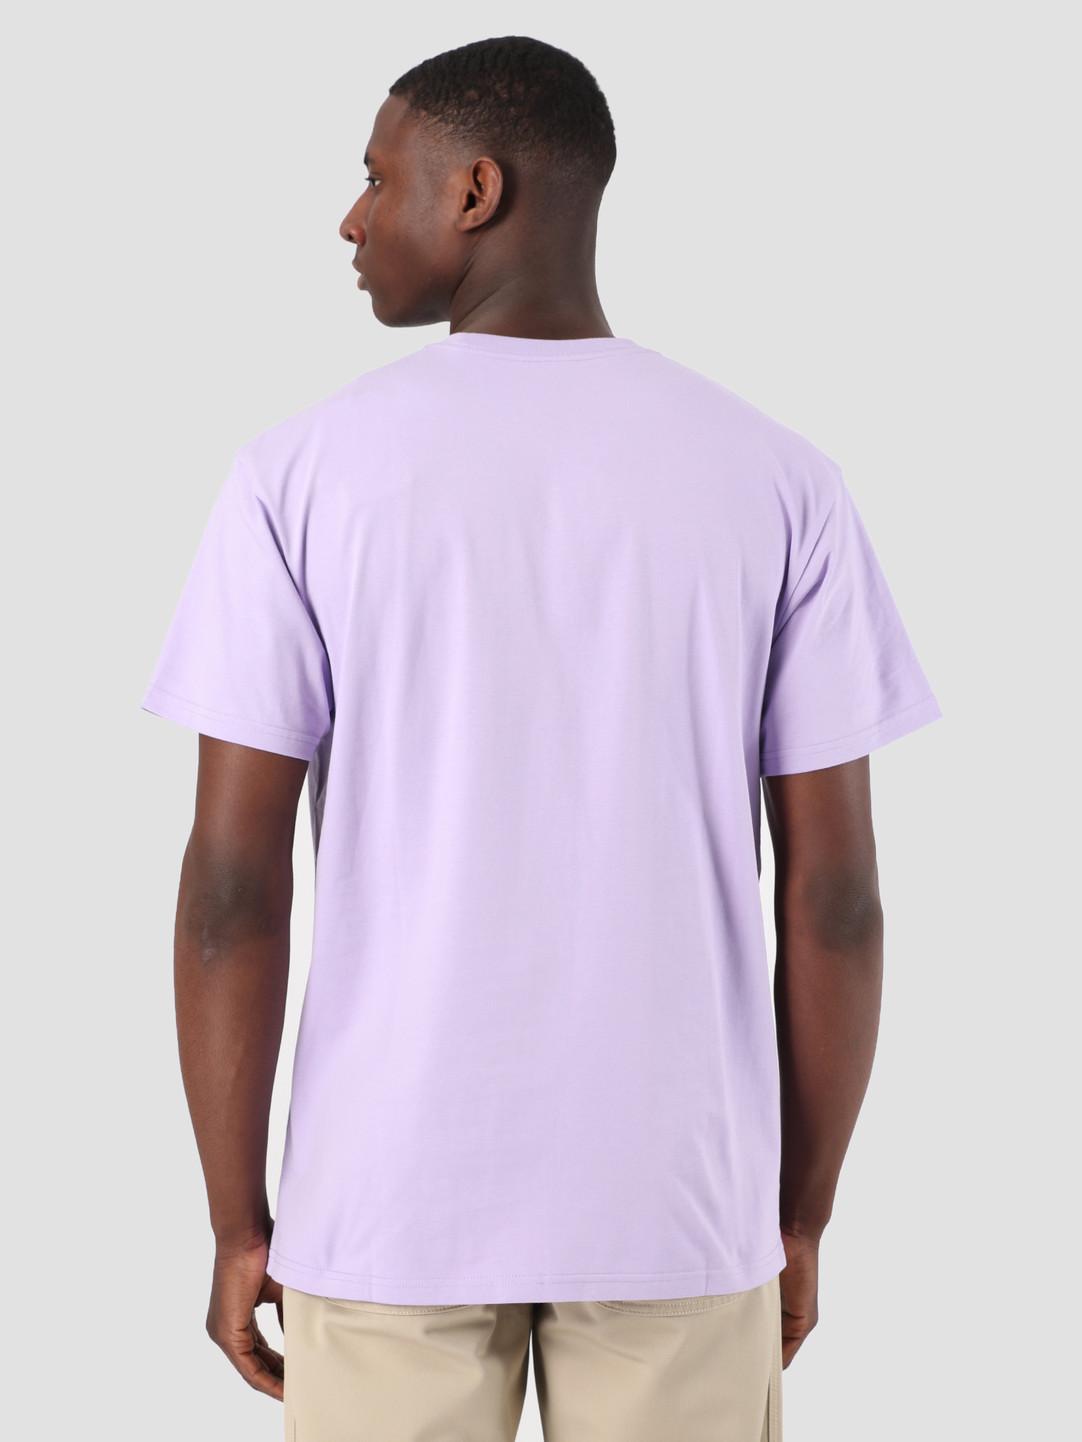 Carhartt WIP Carhartt WIP Short Sleeve Chase T-Shirt Soft Lavender Gold 61091000